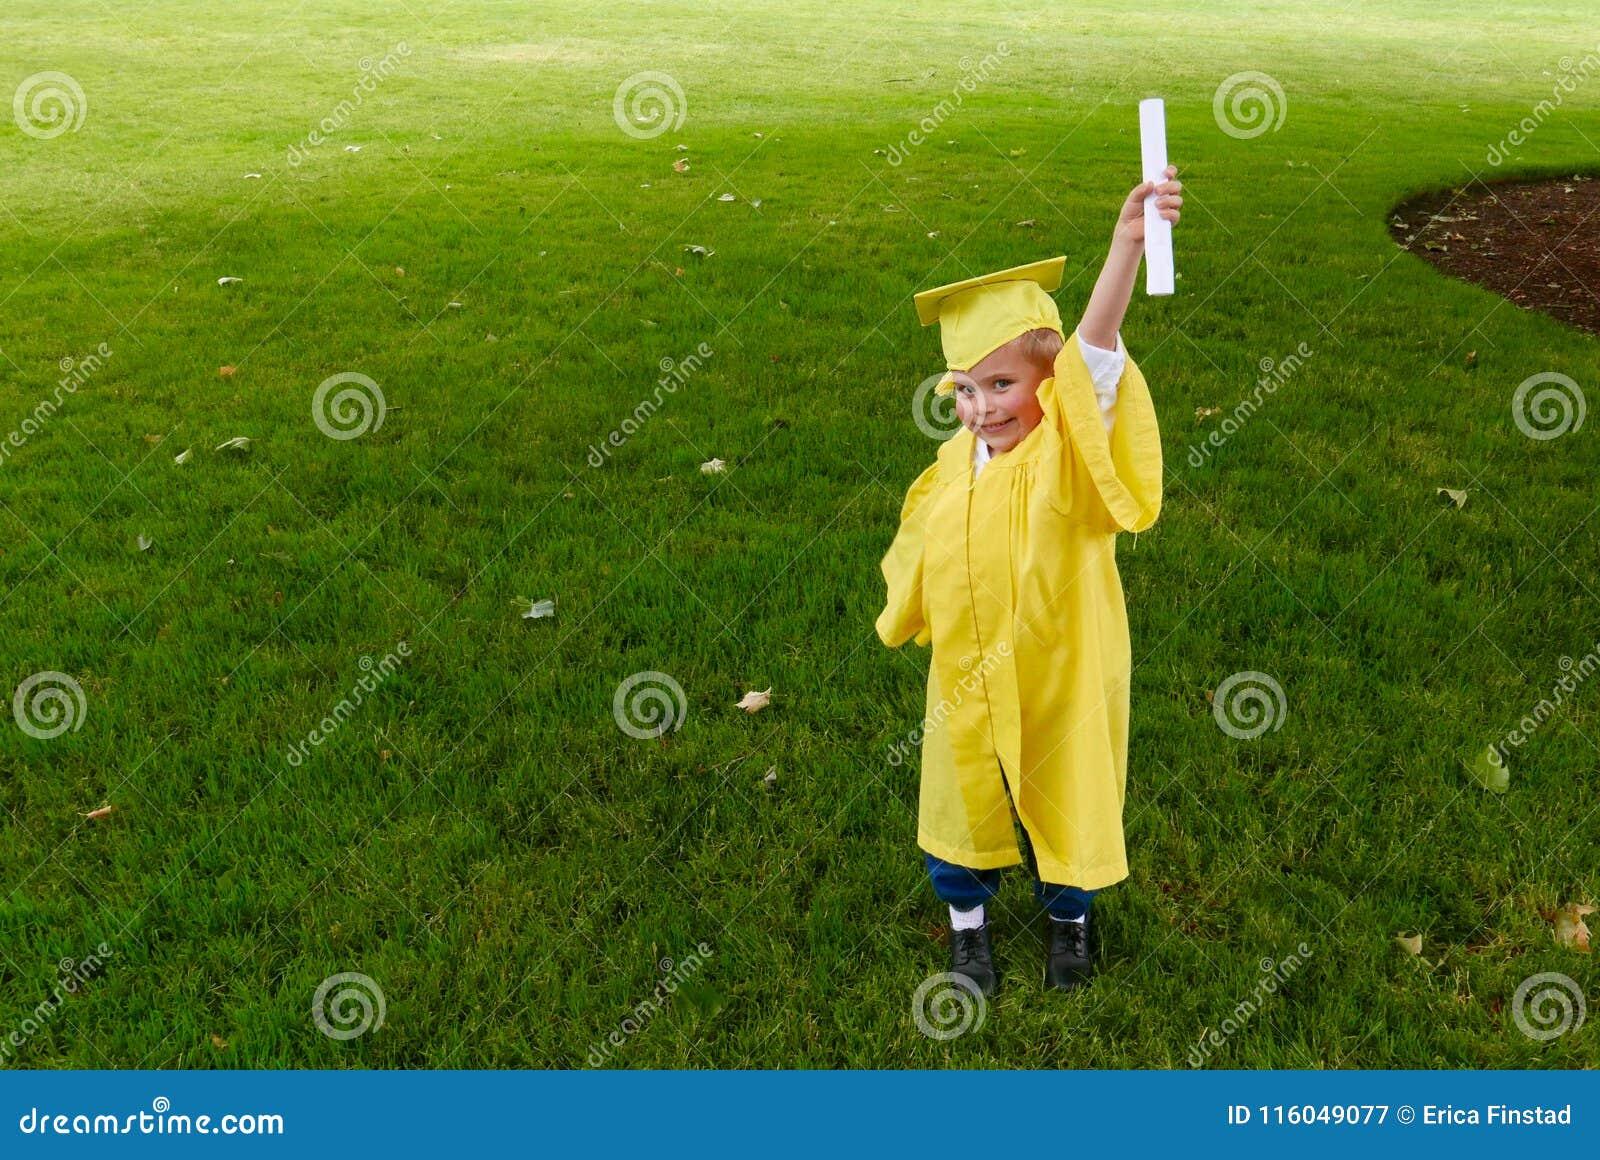 Chłopiec kończy studia od preschool